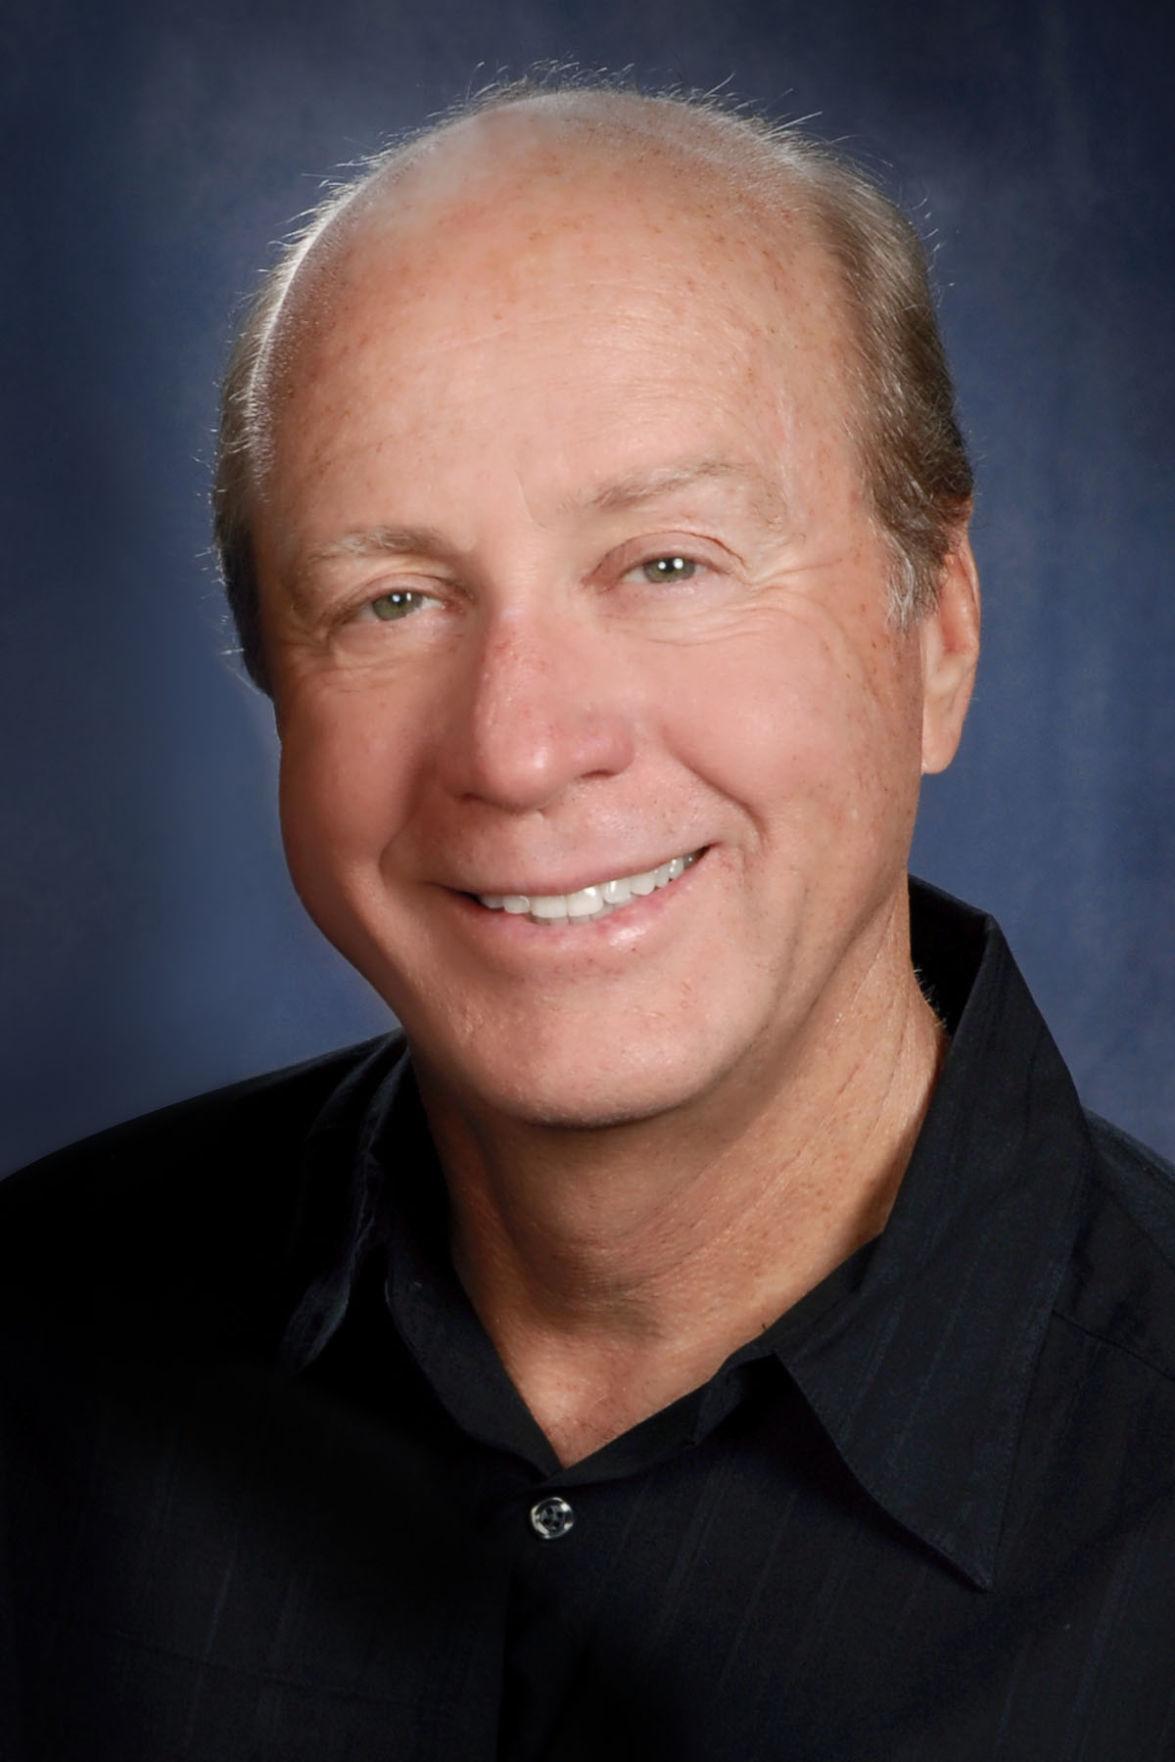 Donald Rutledge